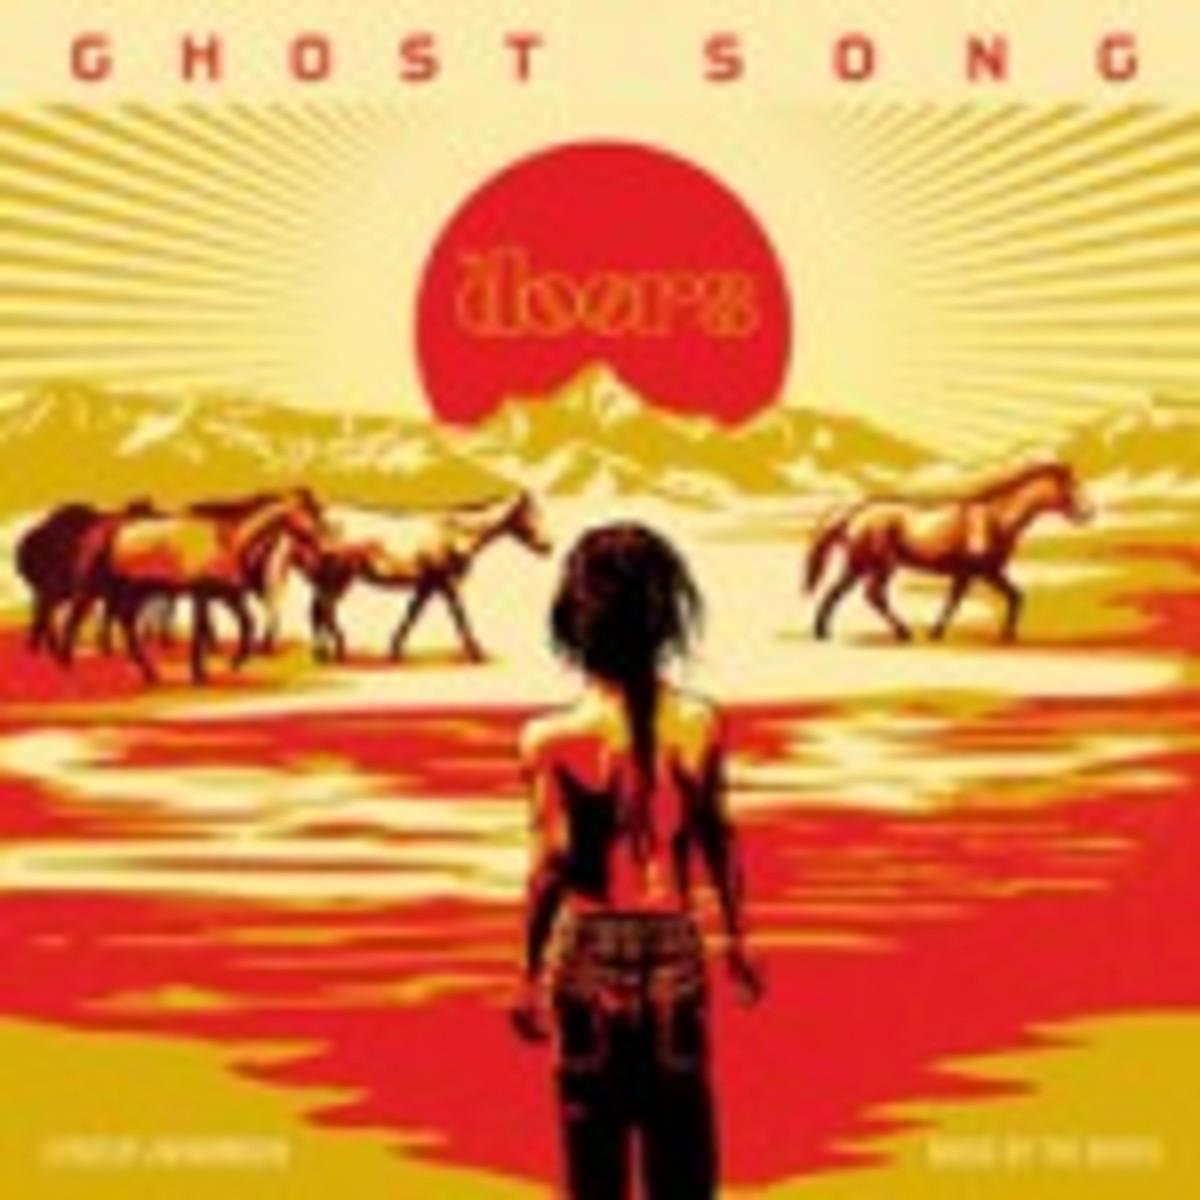 The Doors Ghost Song on vinyl